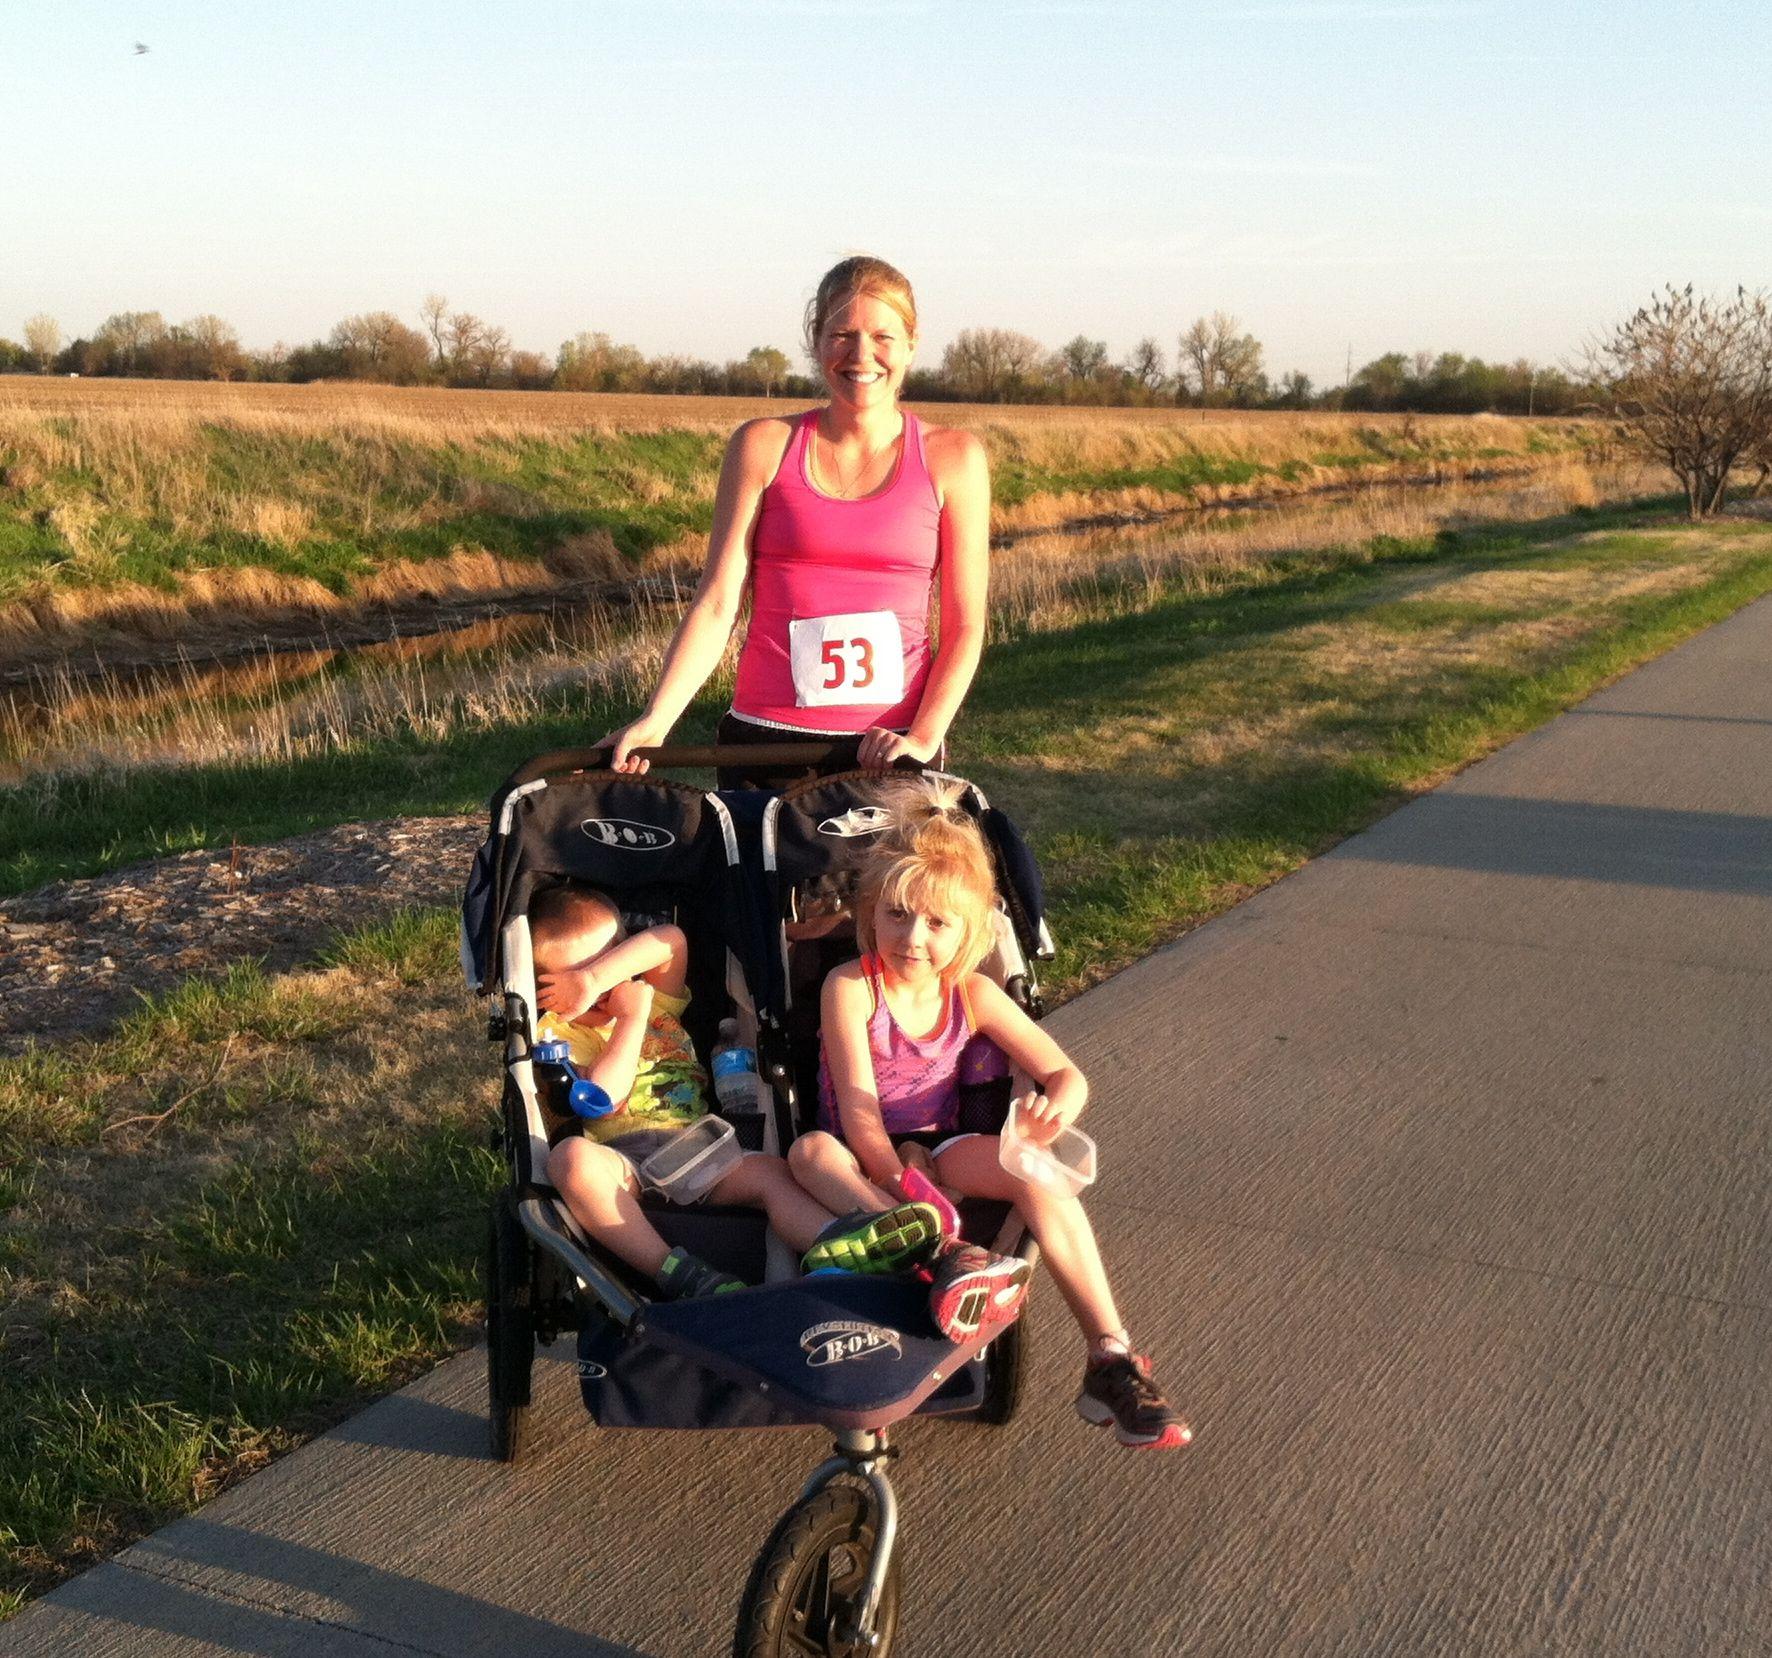 Tips on Stroller Running (With images) Running, Stroller